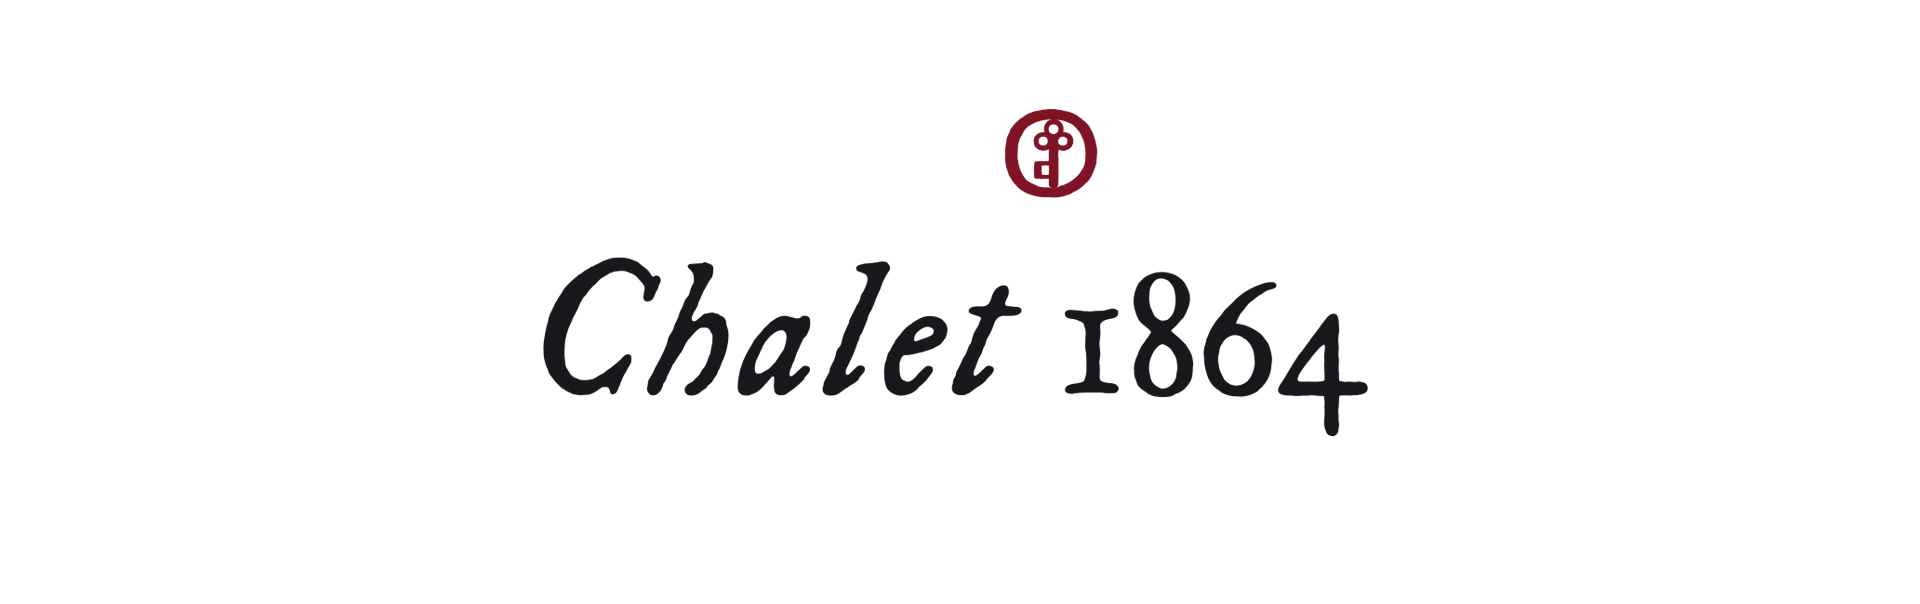 00-Chalet-1864-web